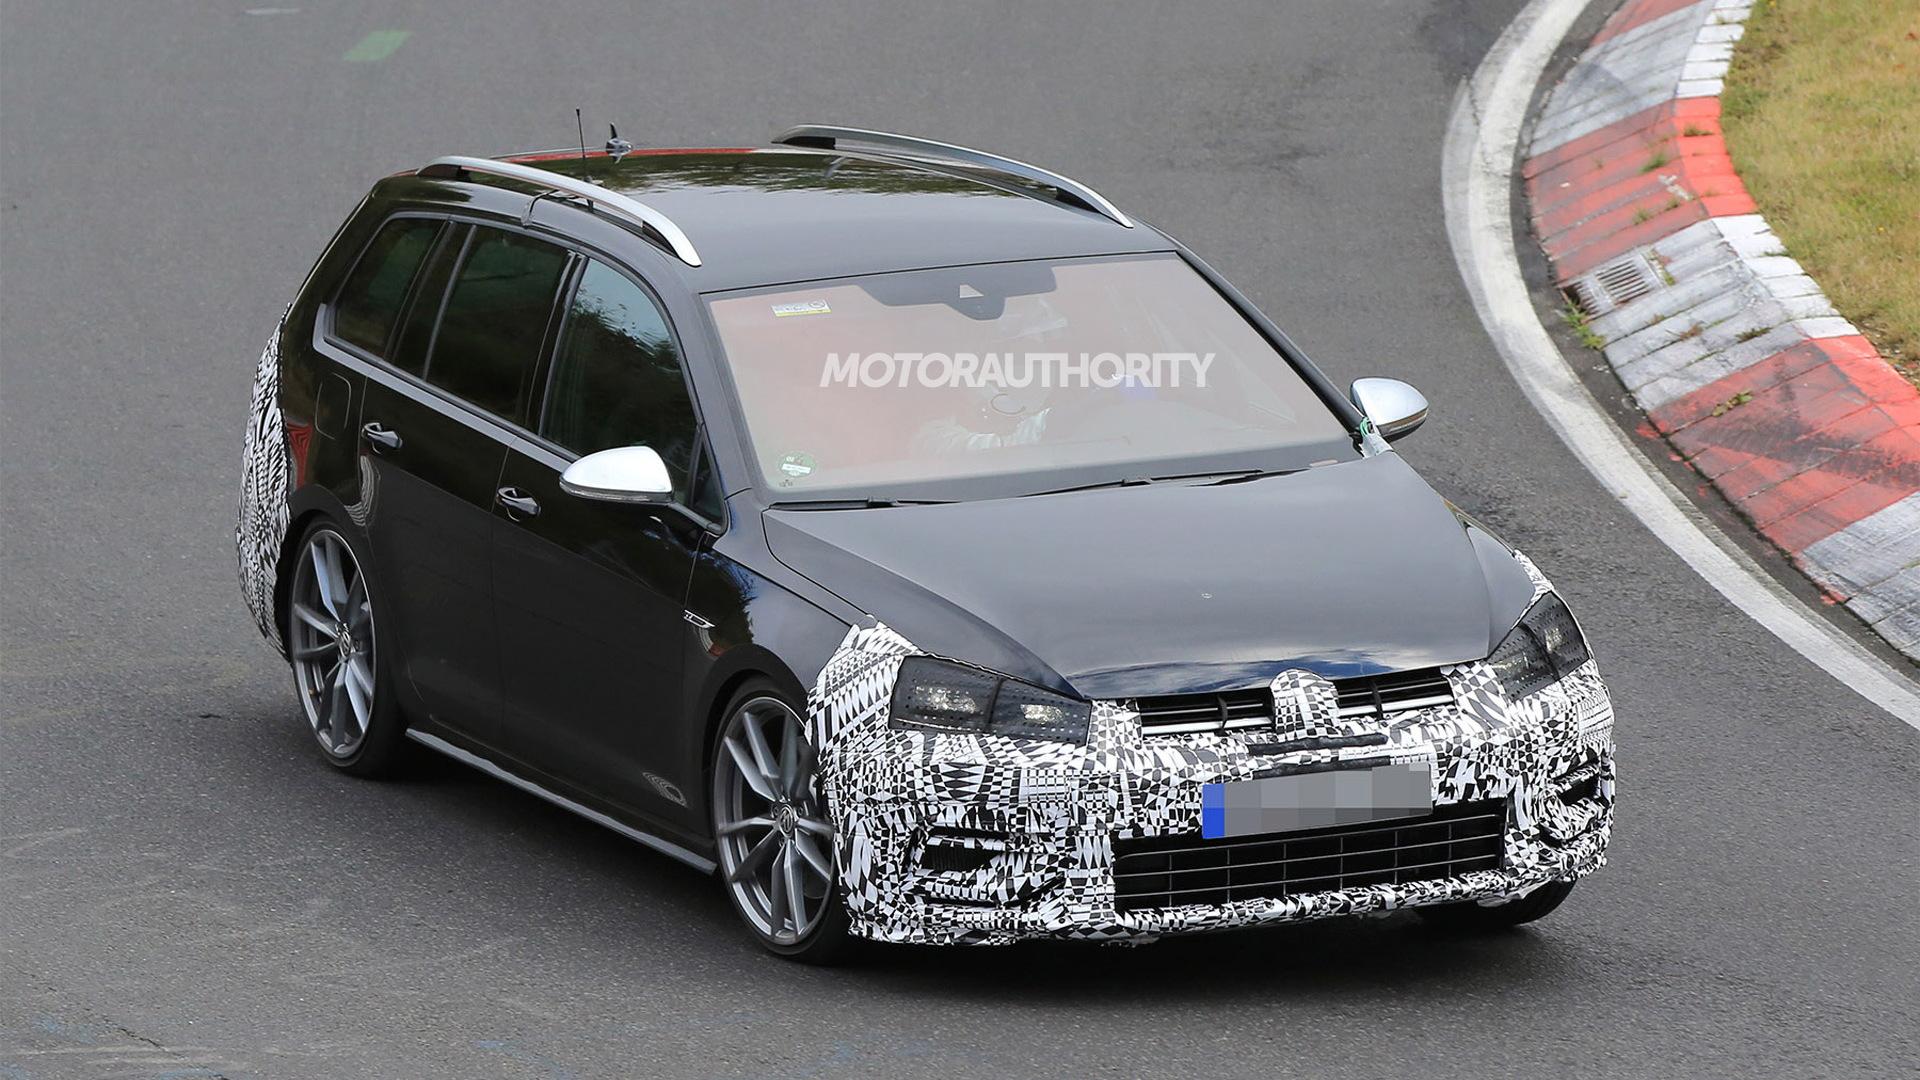 2018 Volkswagen Golf R Variant spy shots - Image via S. Baldauf/SB-Medien